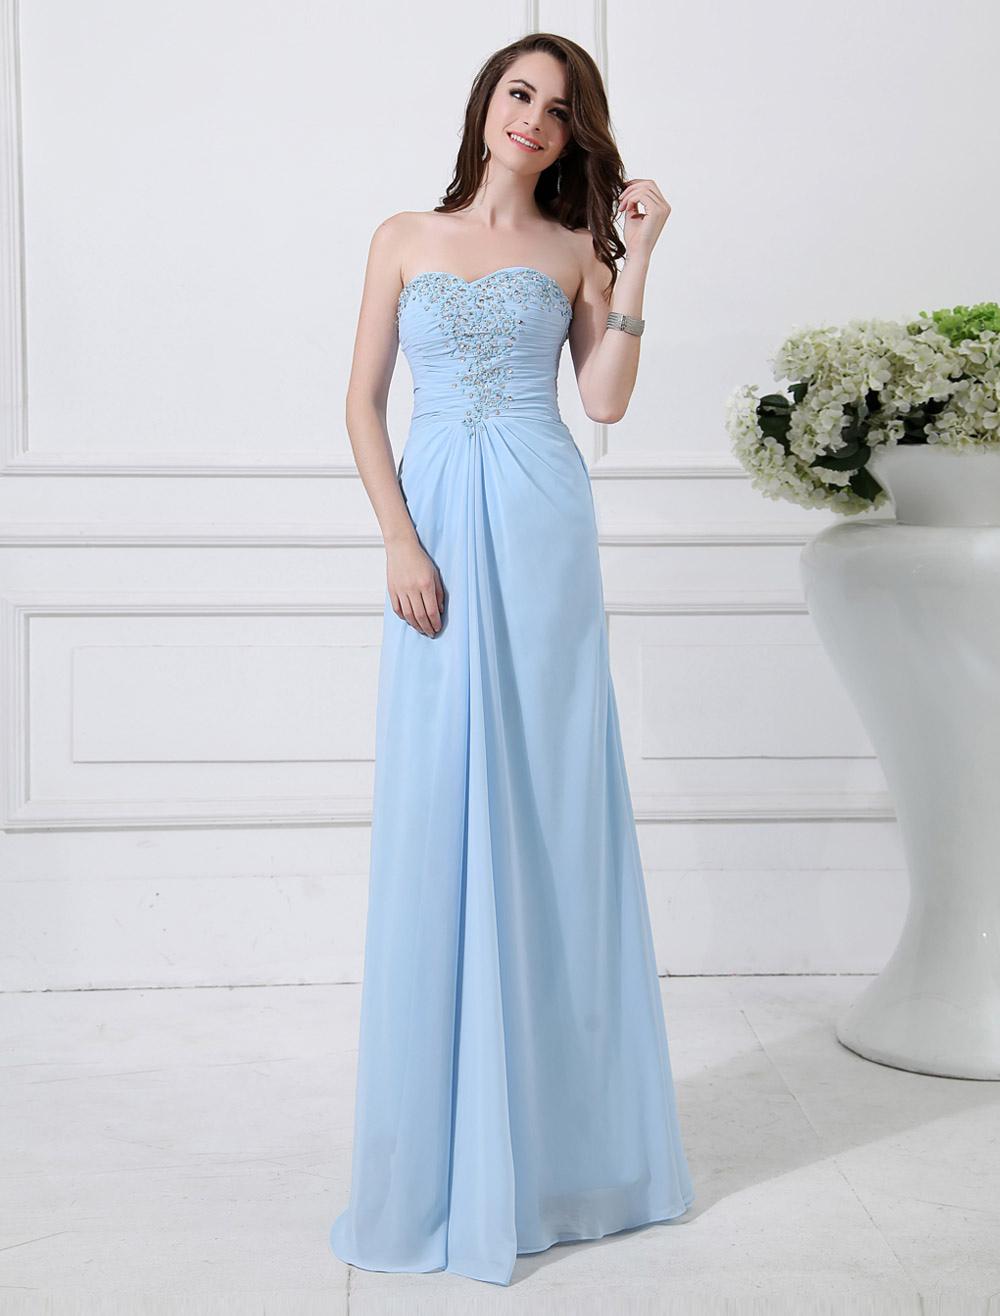 Chiffon Evening Dress Baby Blue Sweetheart Prom Dress Strapless Sleeveless Beading Floor Length Sheath Party Dress (Wedding Evening Dresses) photo